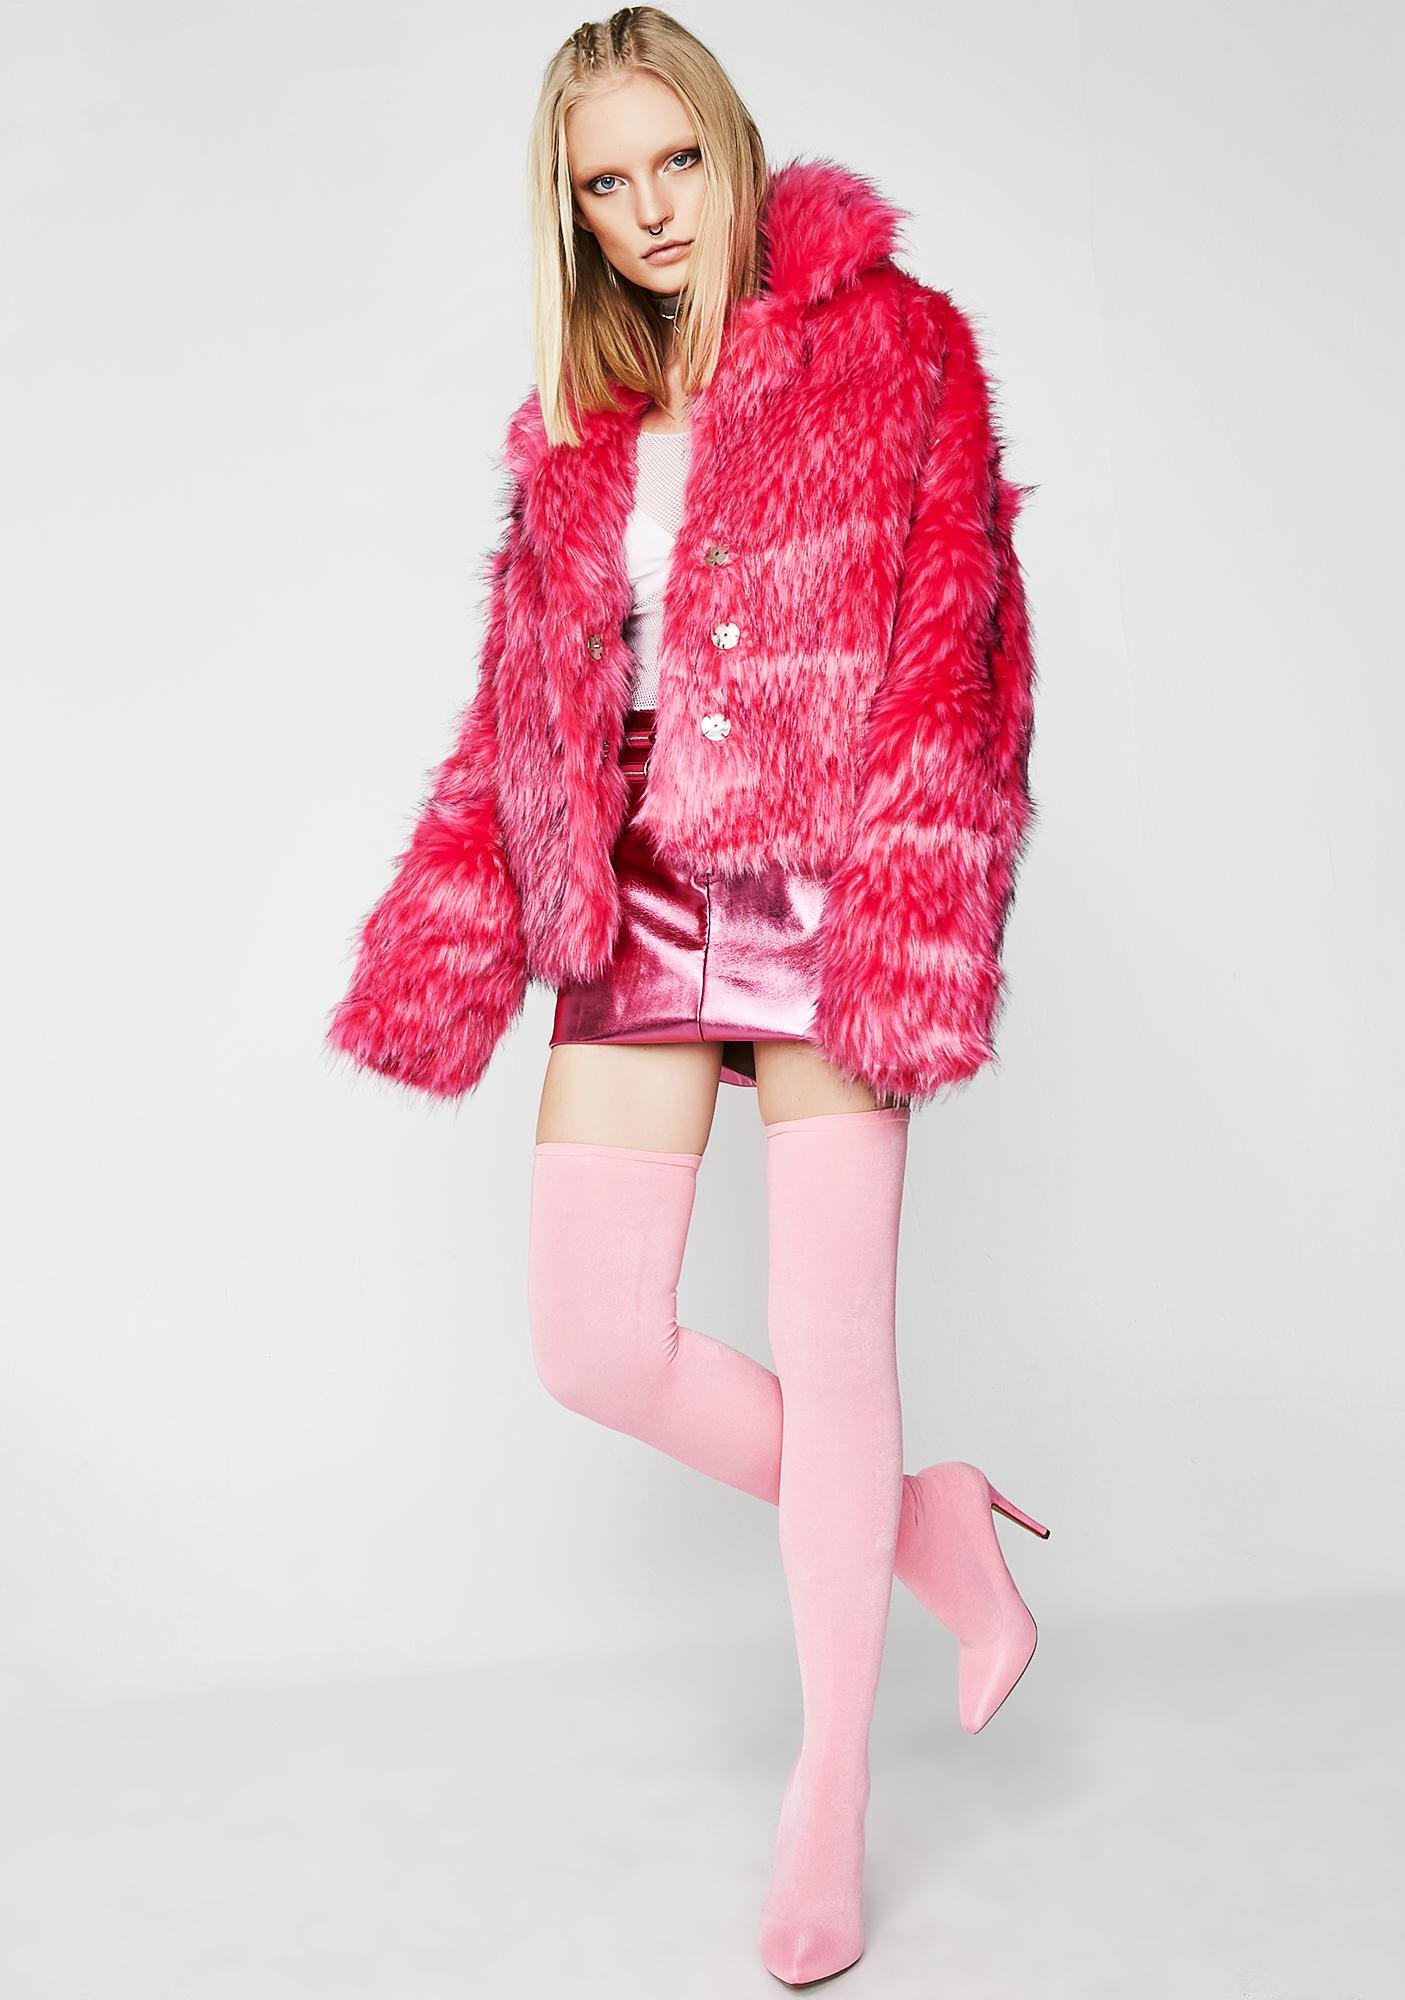 Sugar Easy Breezy Fuzzy Coat